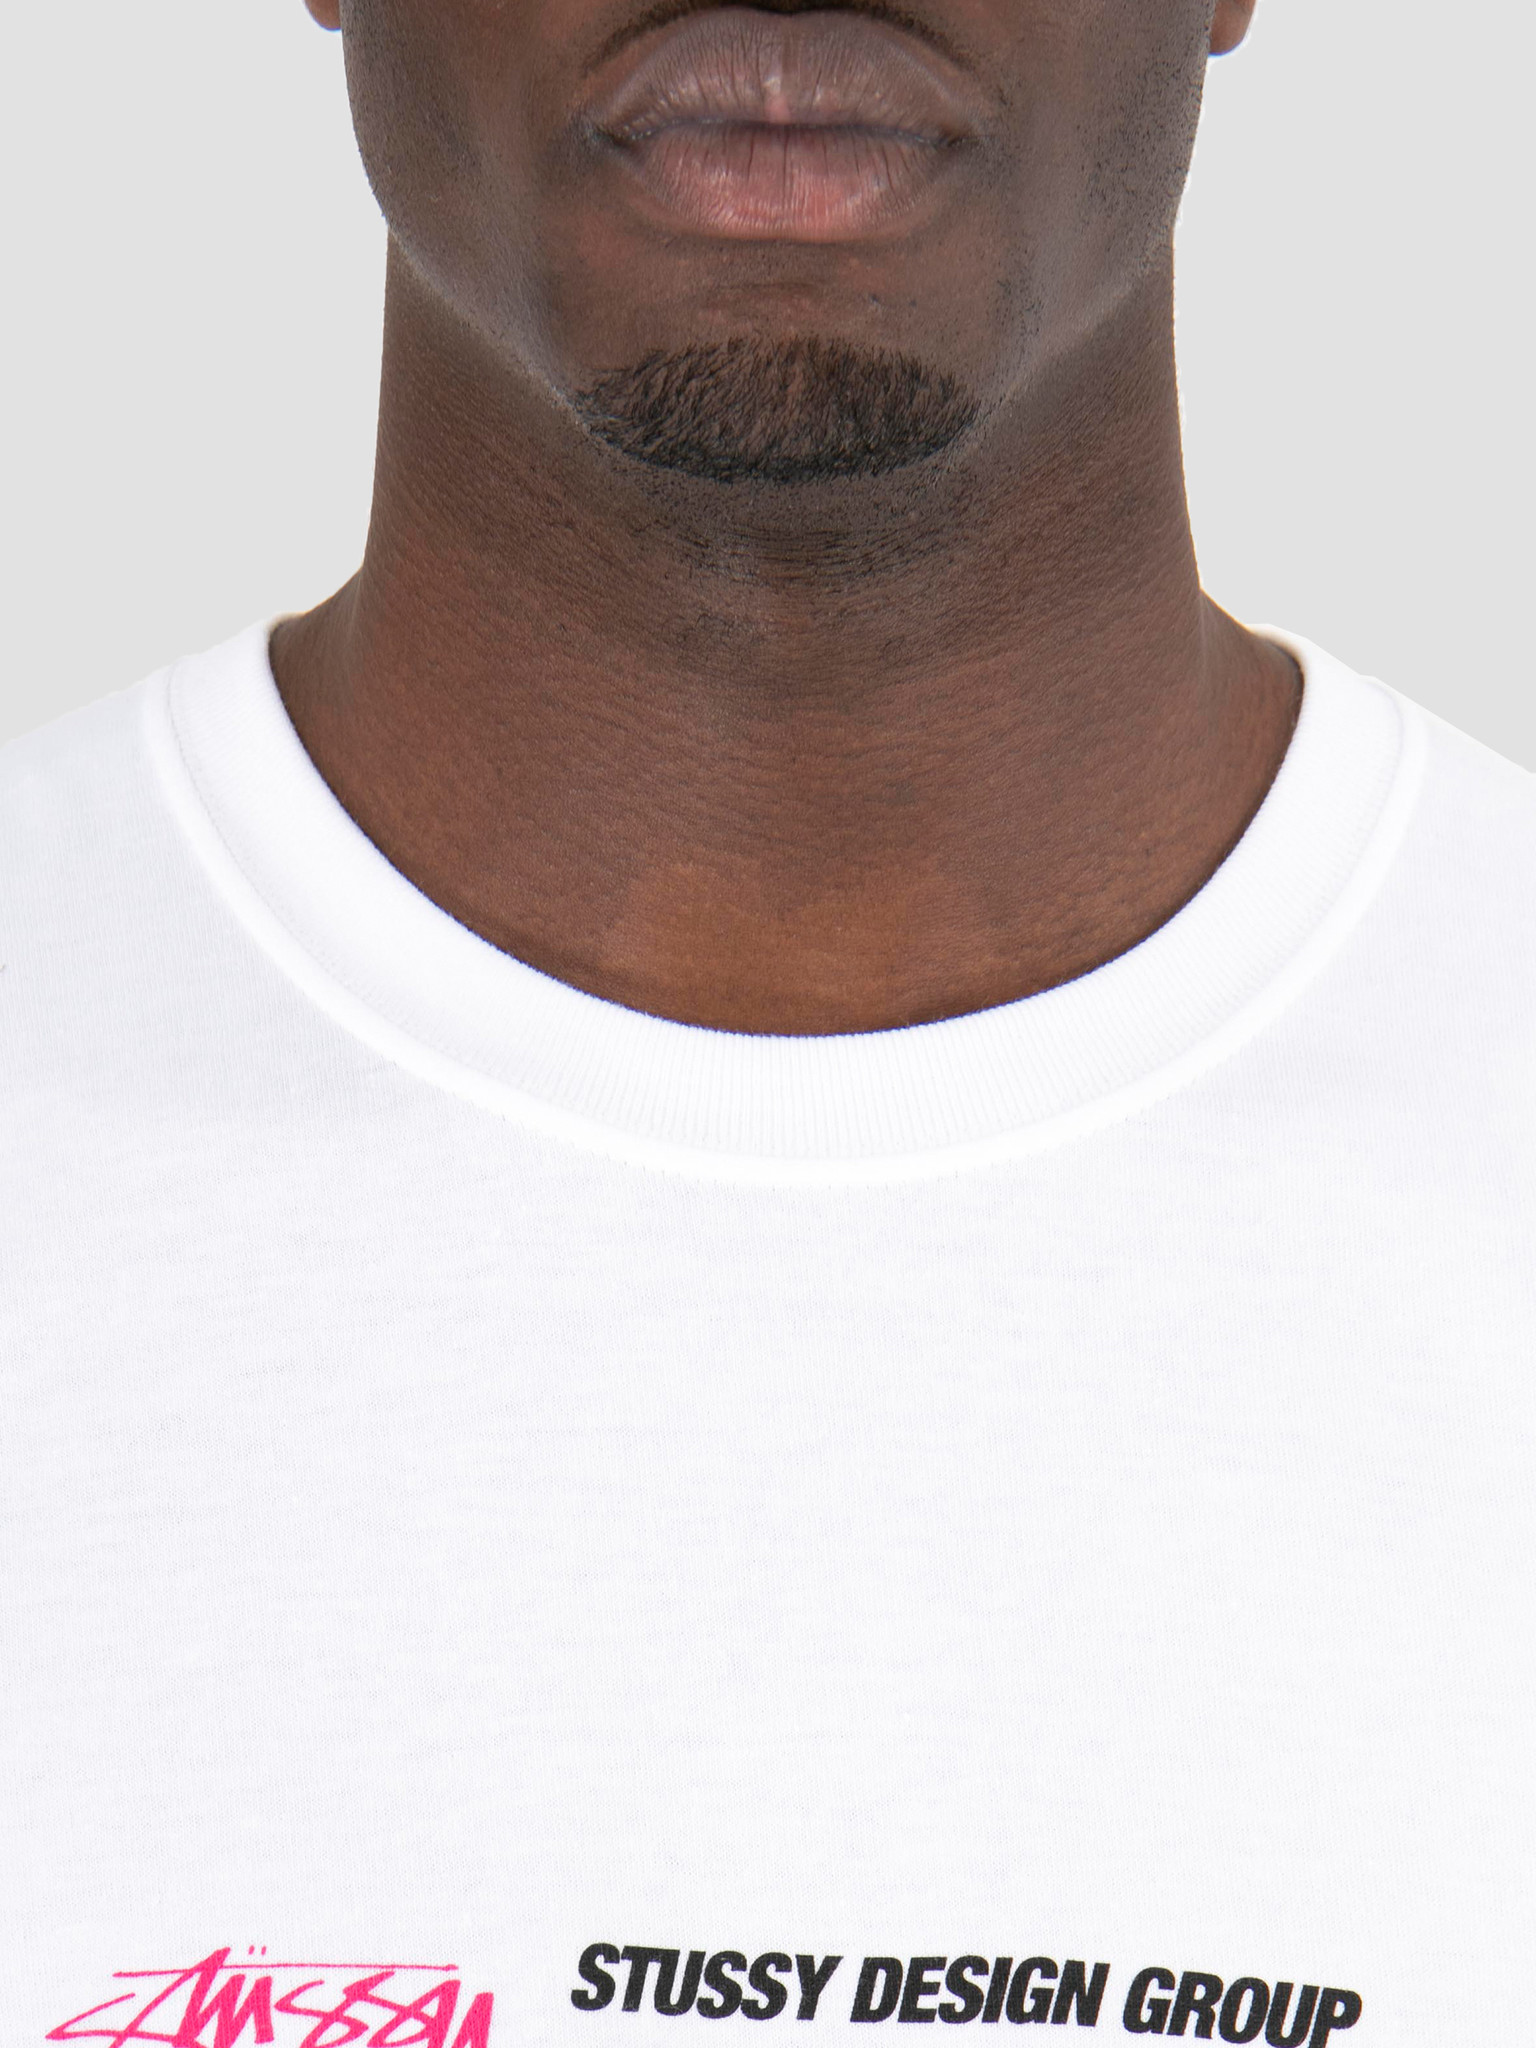 2503432cc Stussy Stussy Design Group T-Shirt White 1201